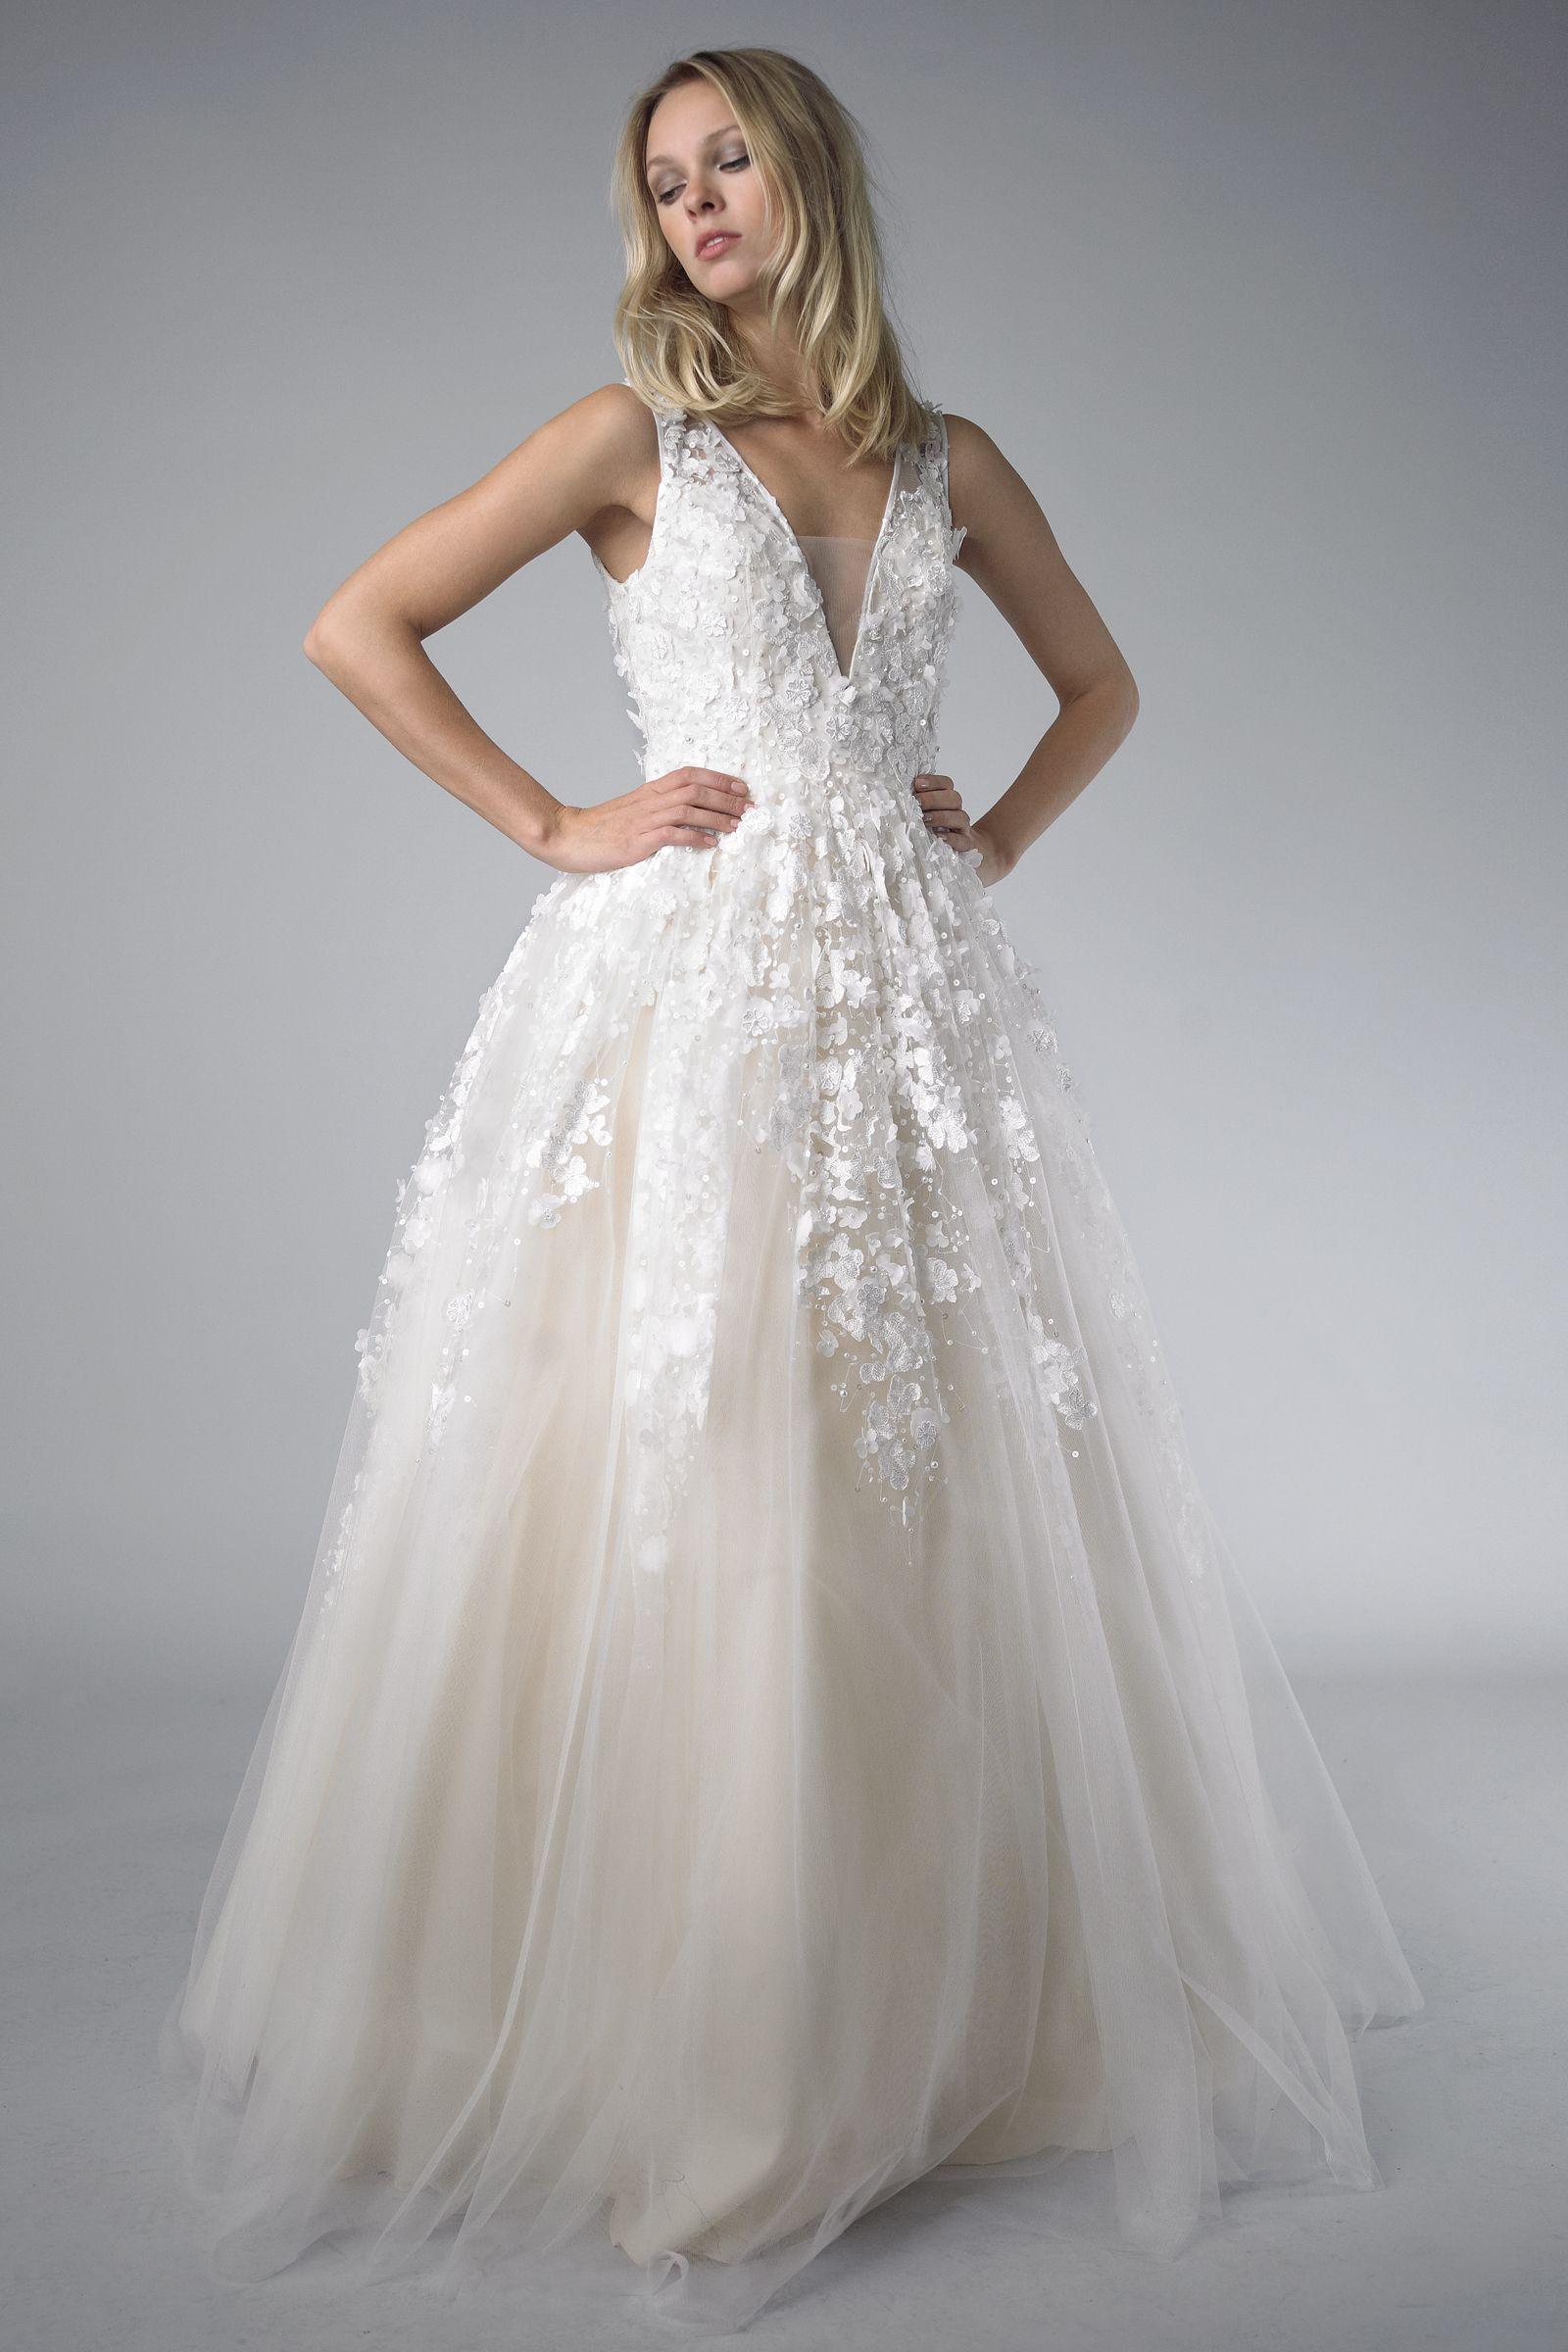 Evening Dress by Basix Black Label | Someday | Pinterest